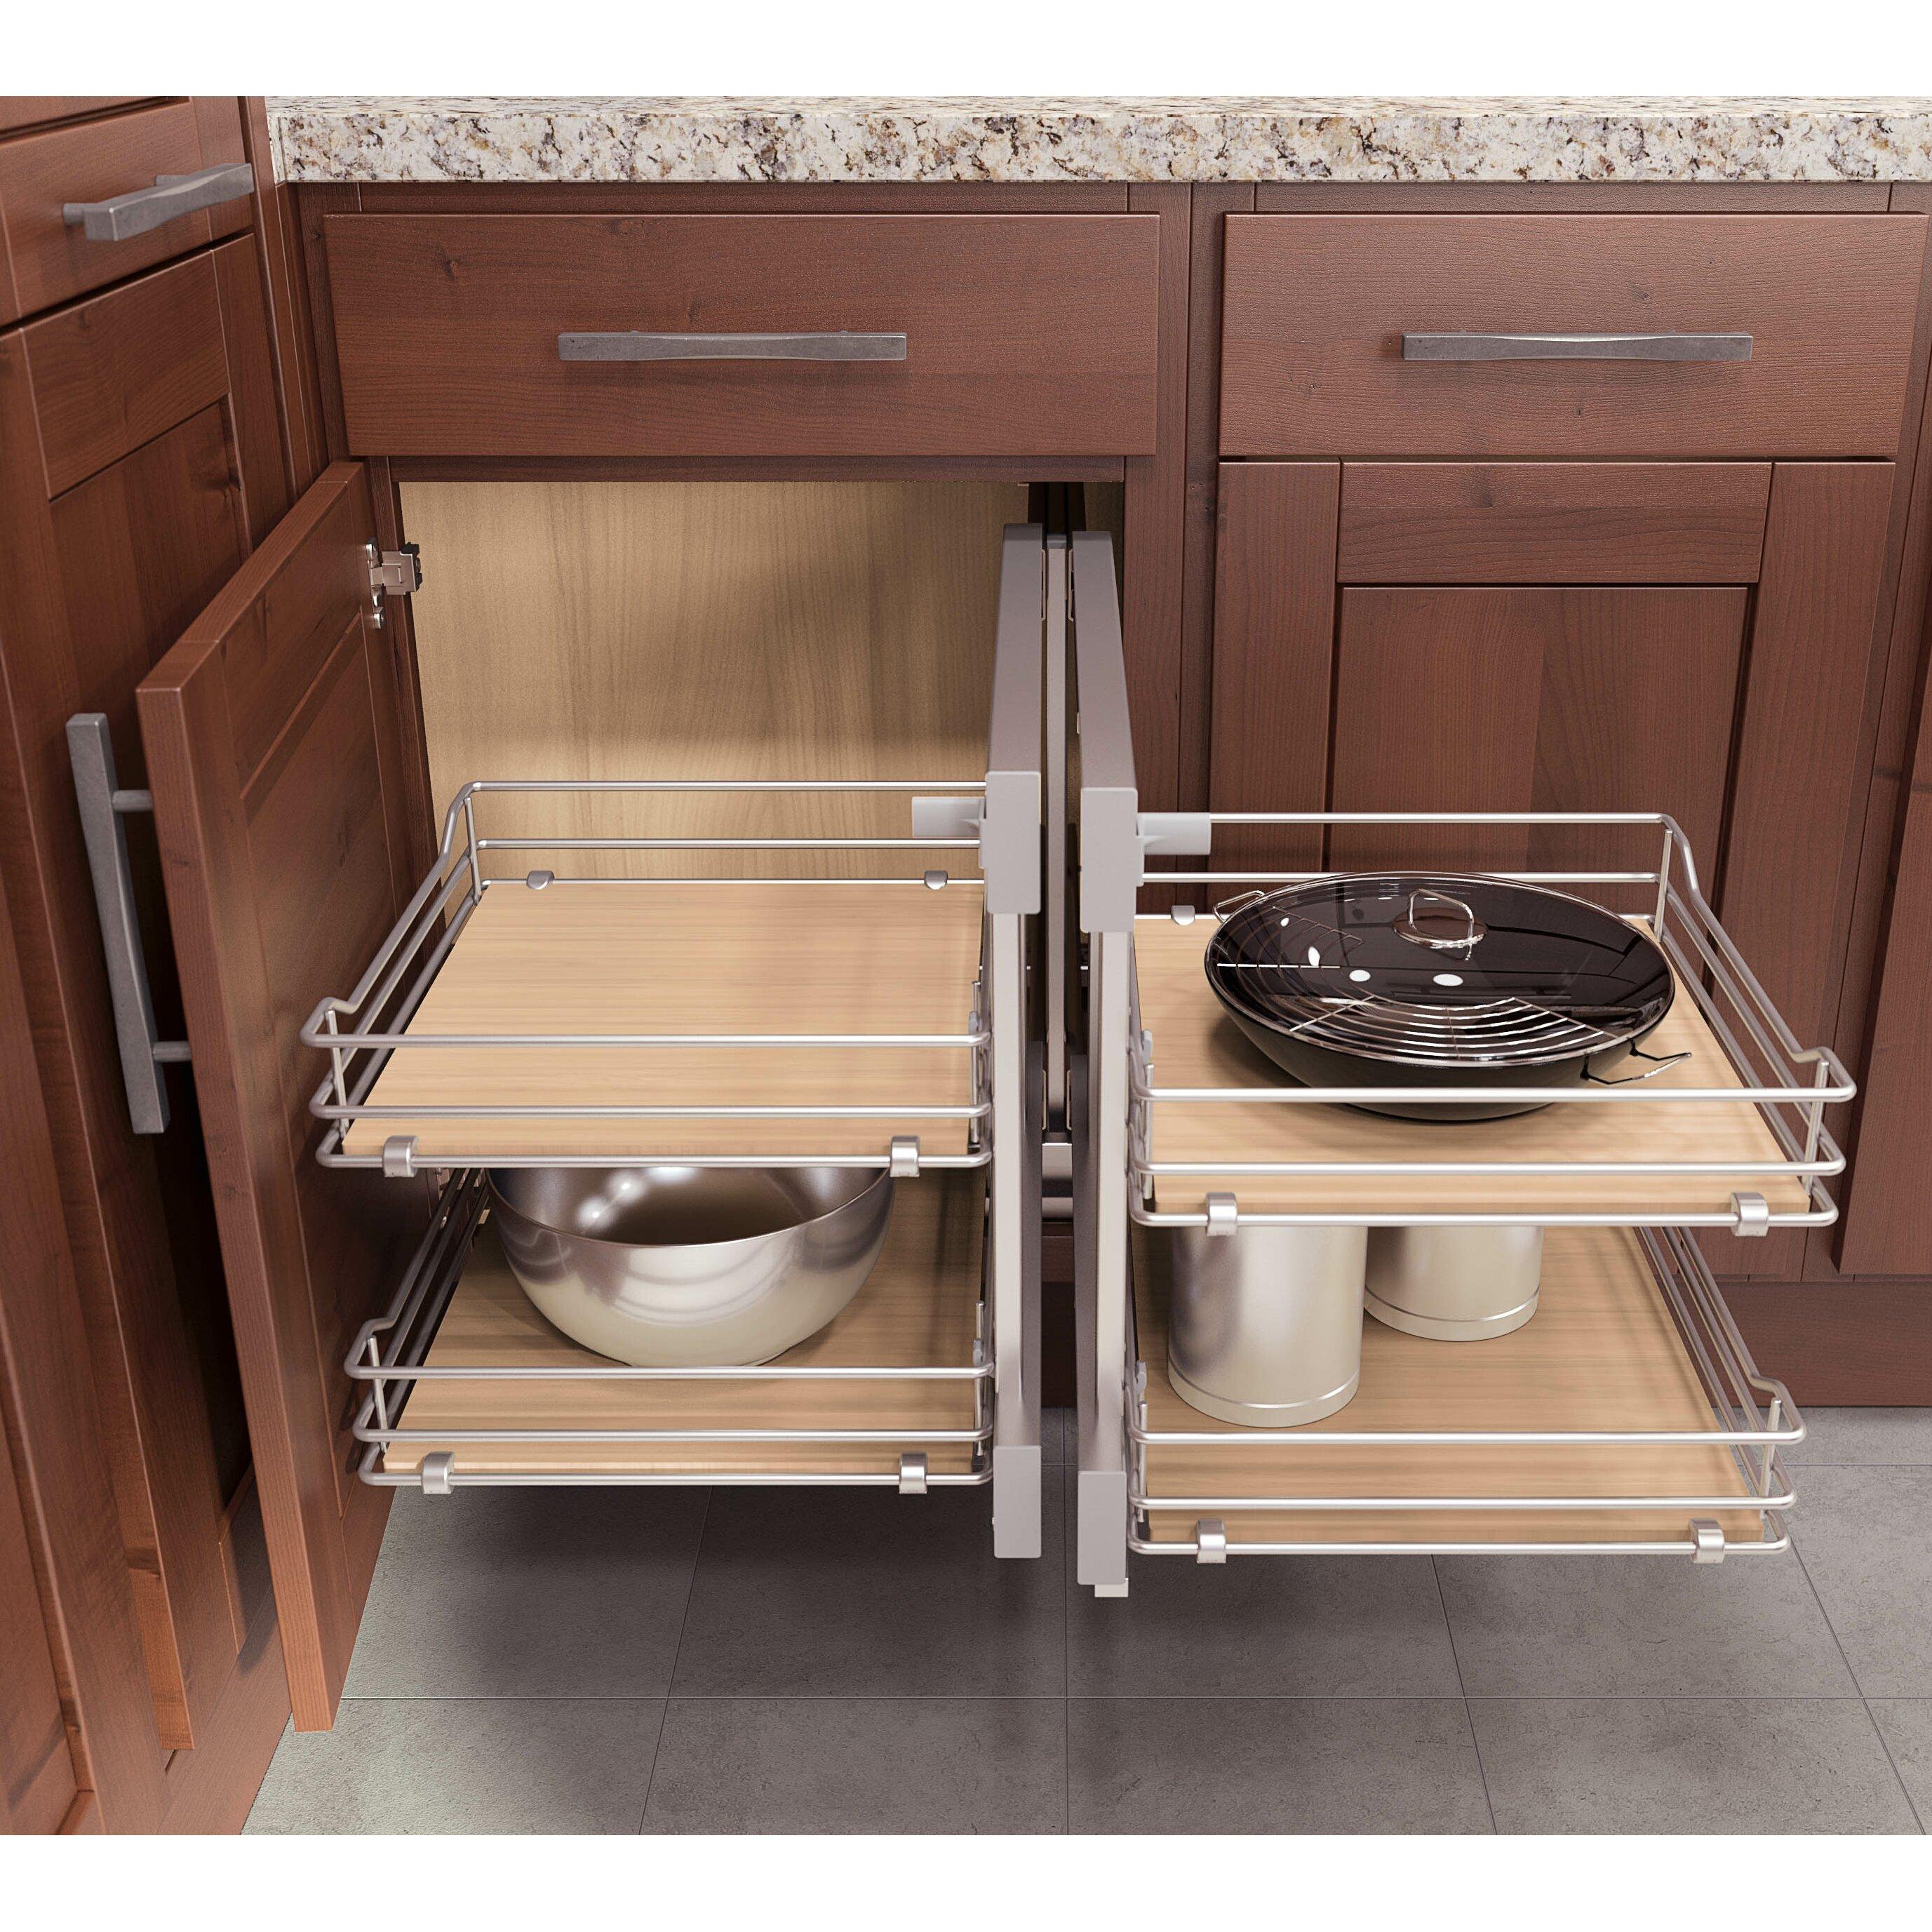 Vauth sagel flex corner basket for cabinet wayfair for Wayfair kitchen cabinets